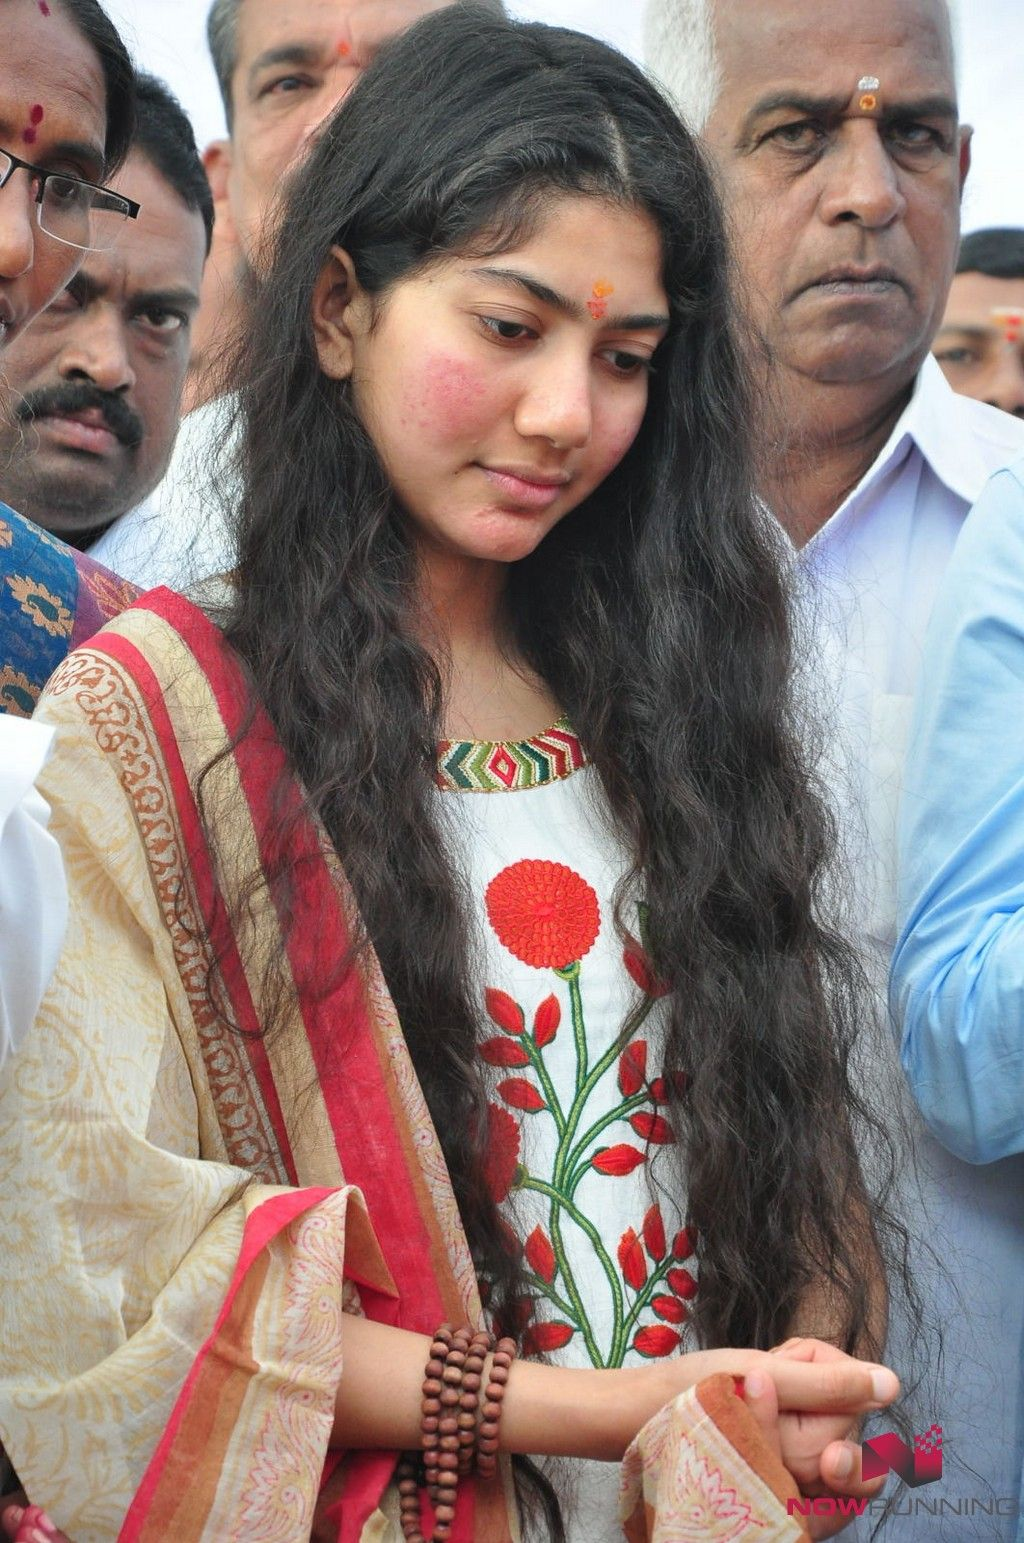 Fida Movie Opening Sai Pallavi Hd Images Movies Telugu Movies